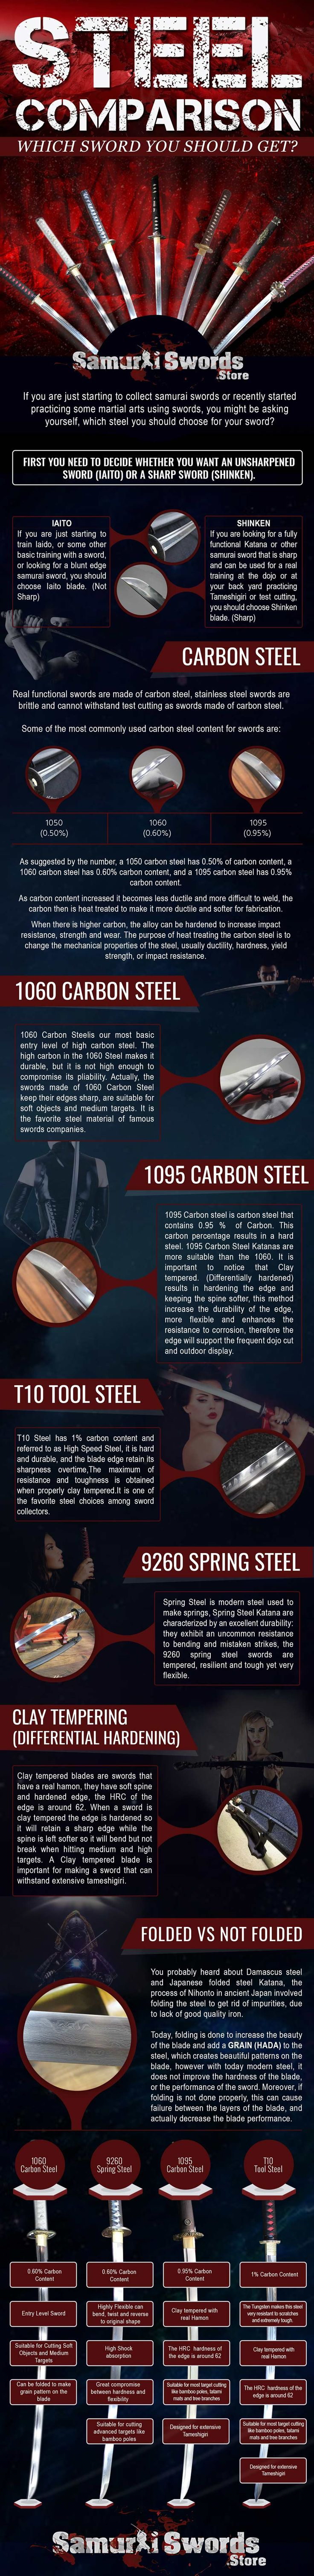 Steel Comparison - Samurai Swords Store